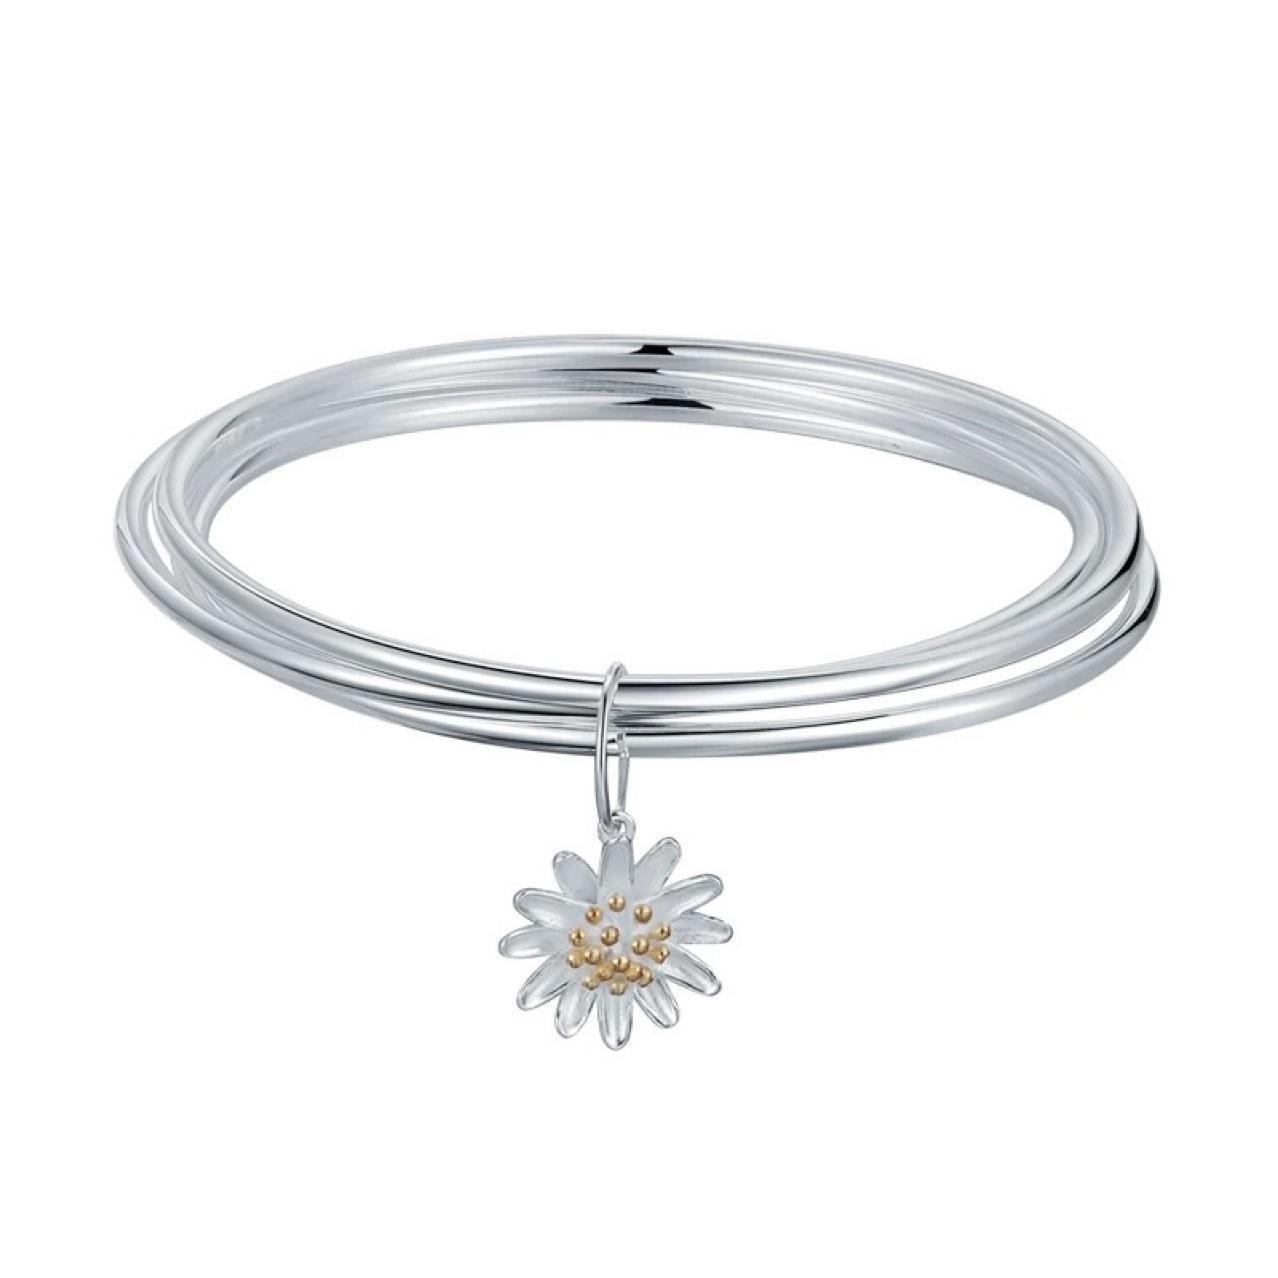 Tre cerchio liscio piccolo daisy sansheng iii braccialetto fresco braccialetto bianco rame Braccialefbu1